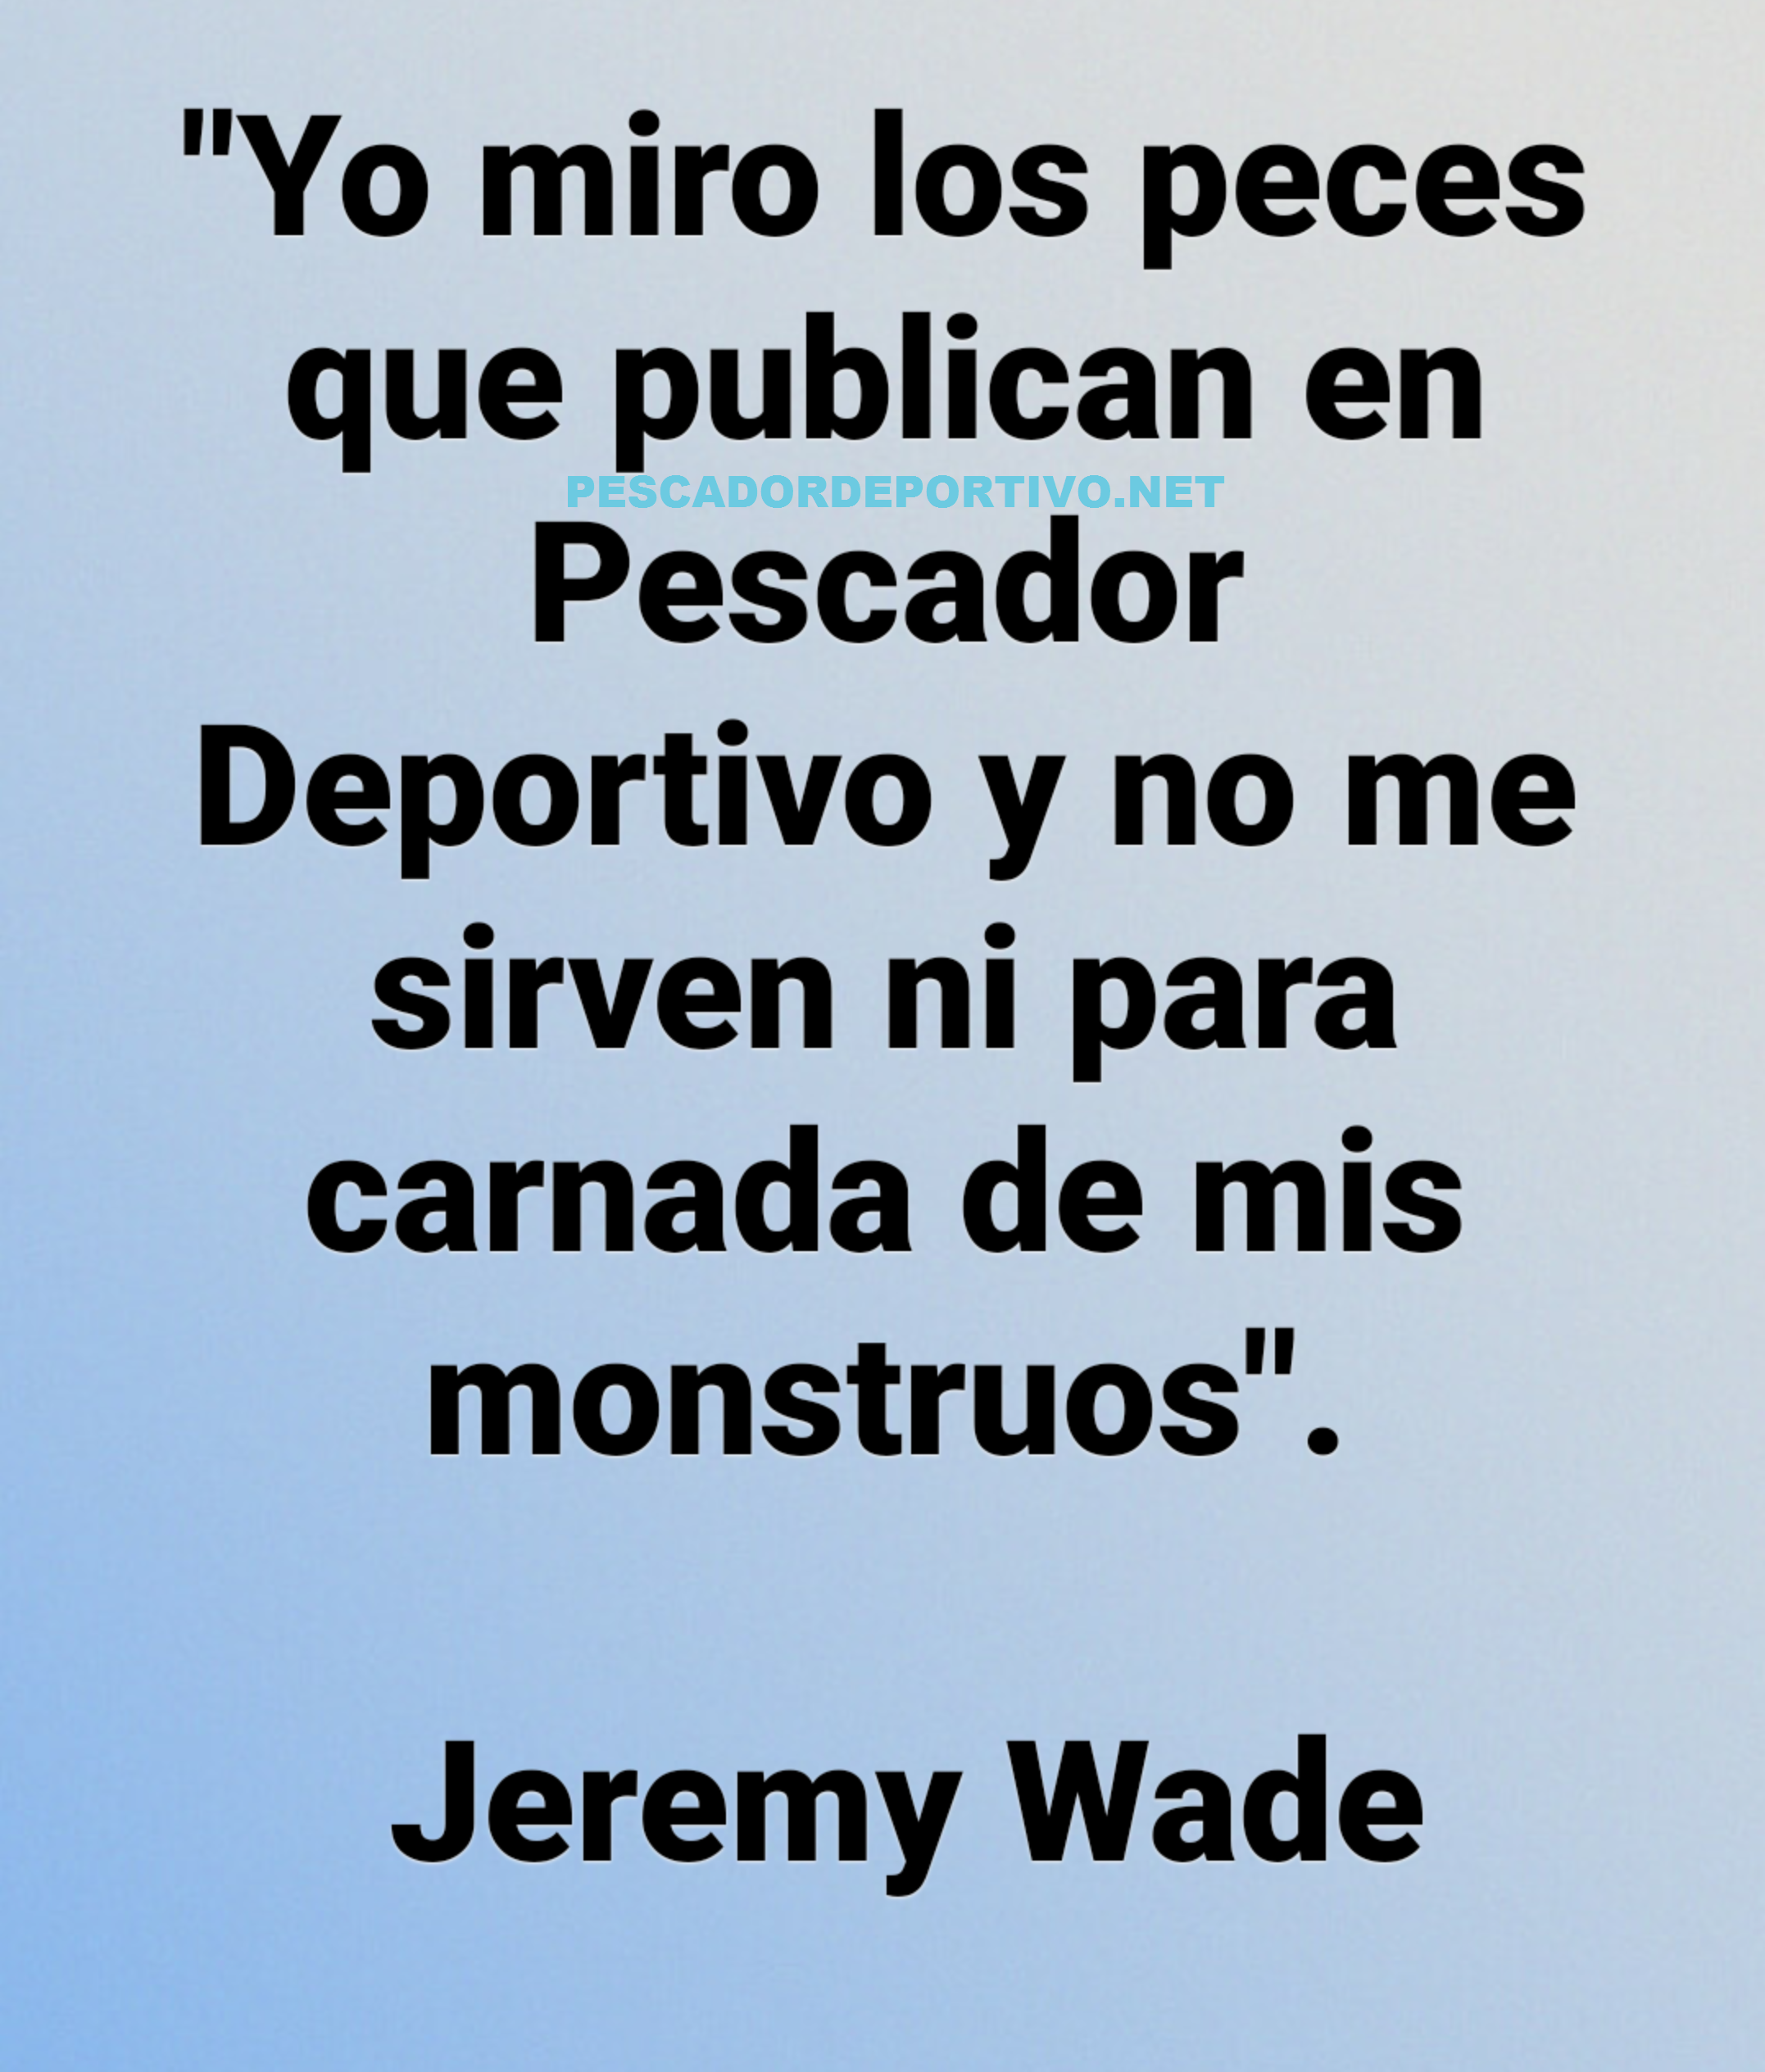 Meme Jeremy Wade 6